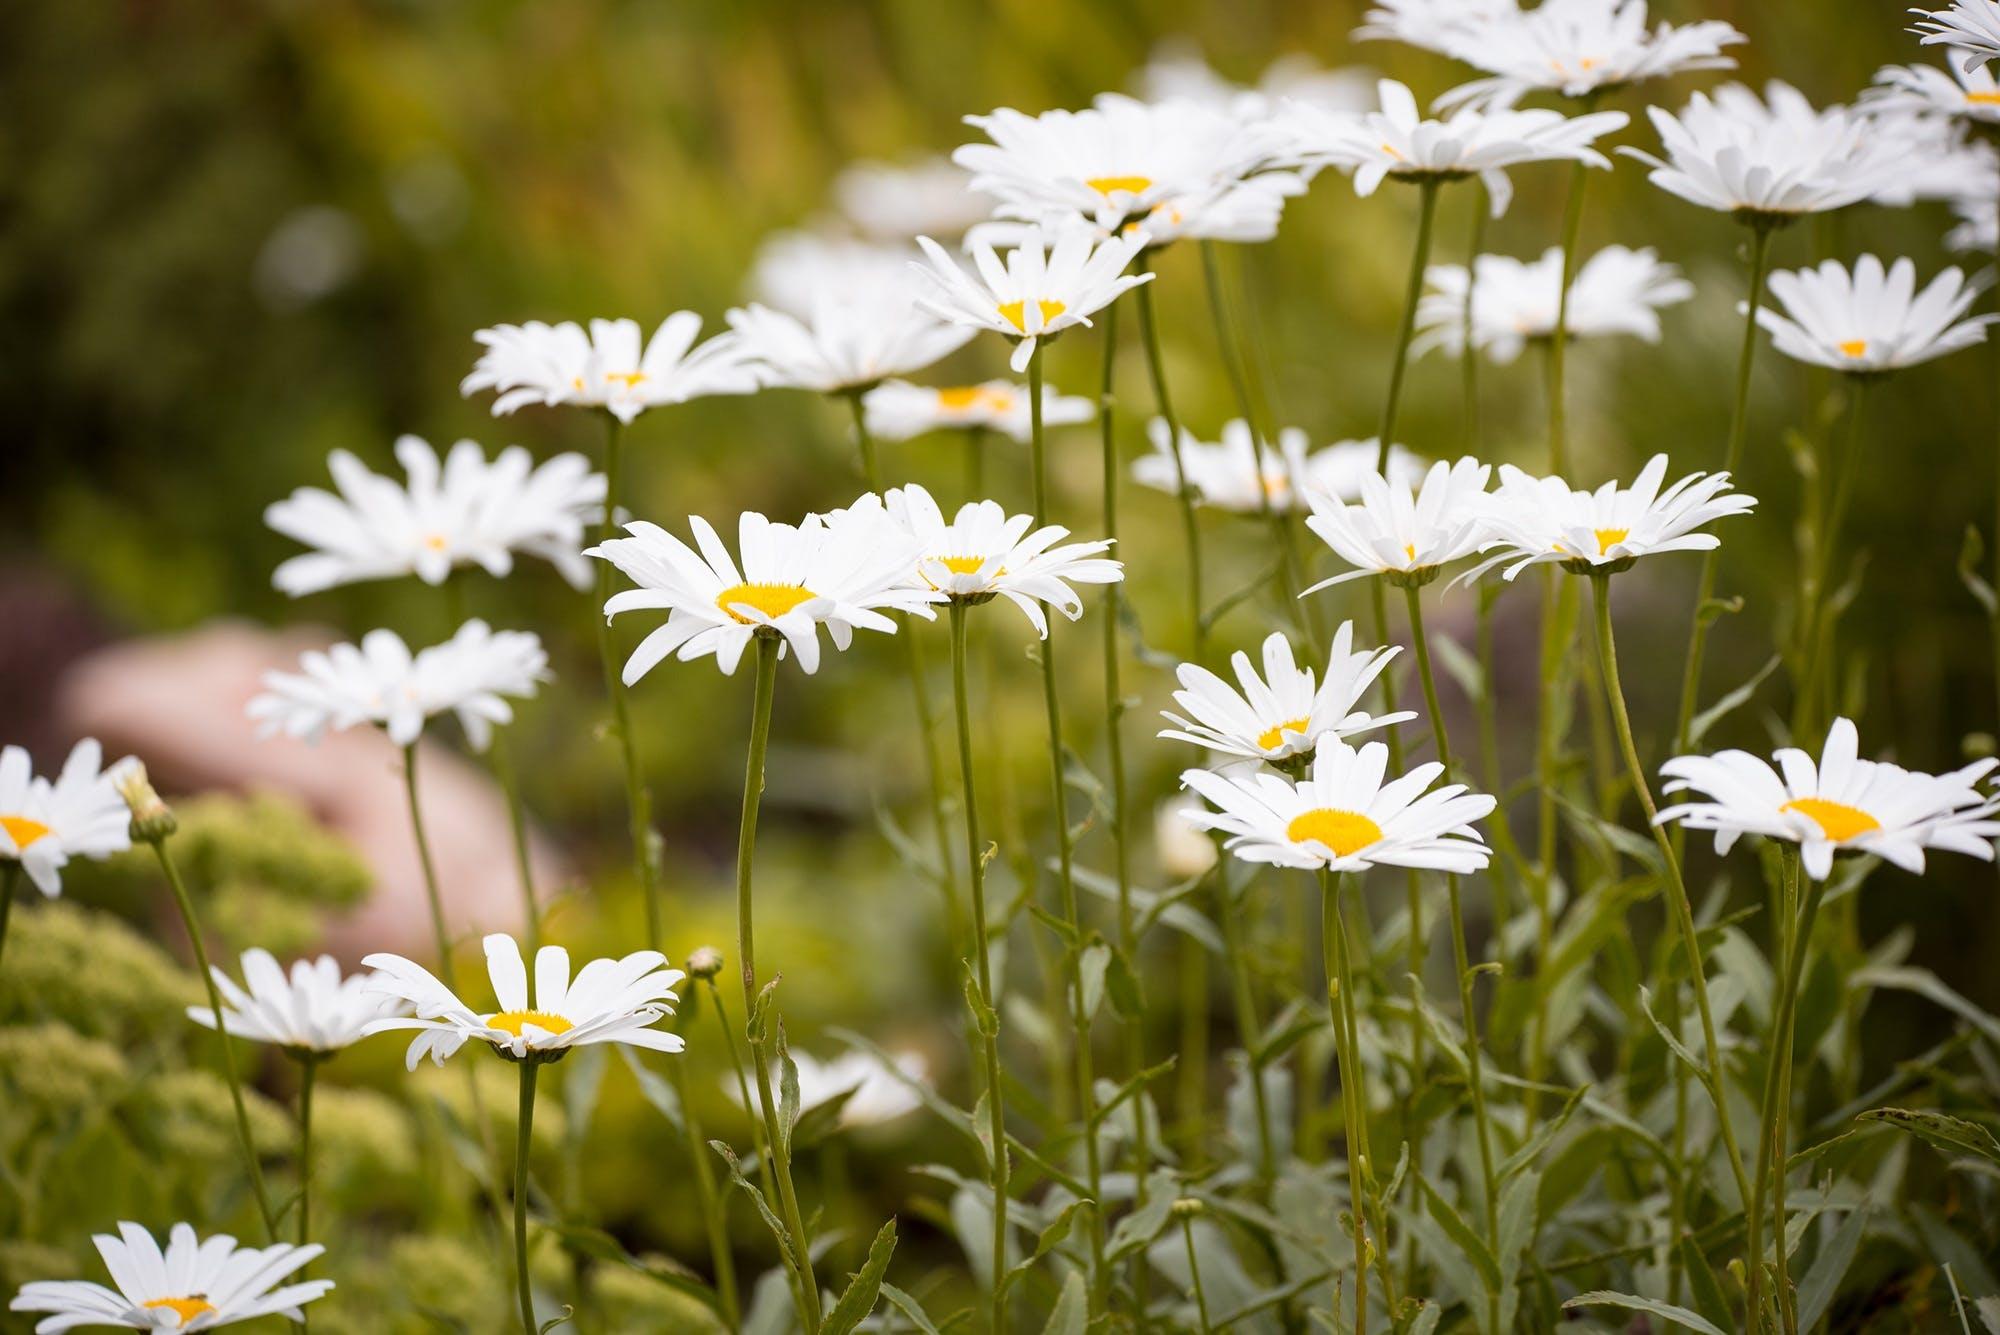 Close Up Photo of White Petaled Flower Plant